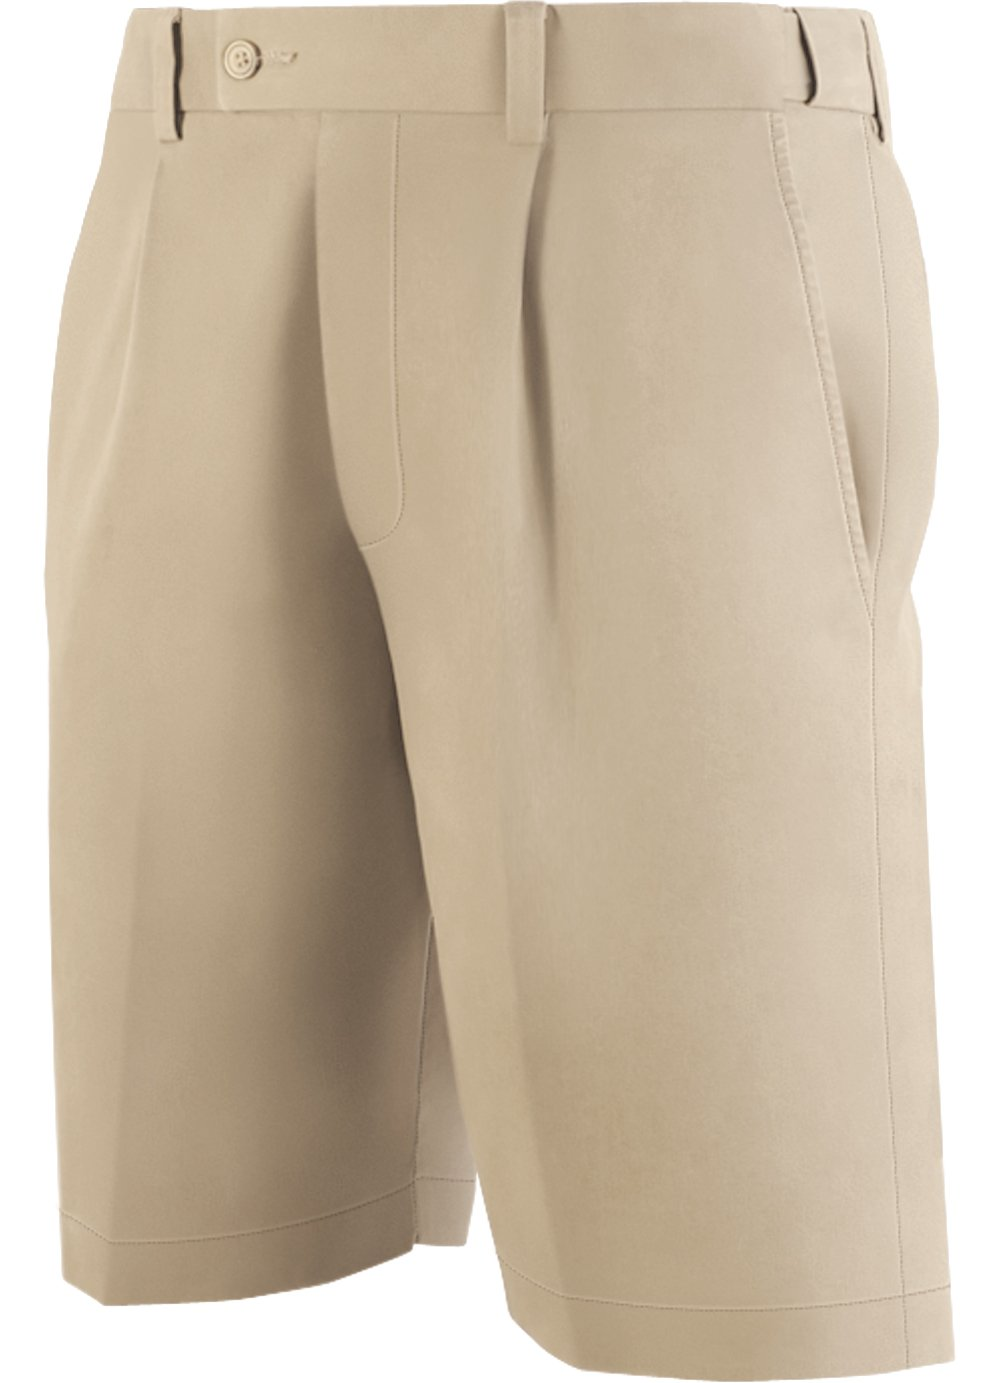 Havana Smooth's Luxury, Breathable Golf Shorts for Men, Tan 32. Stretch Waist.